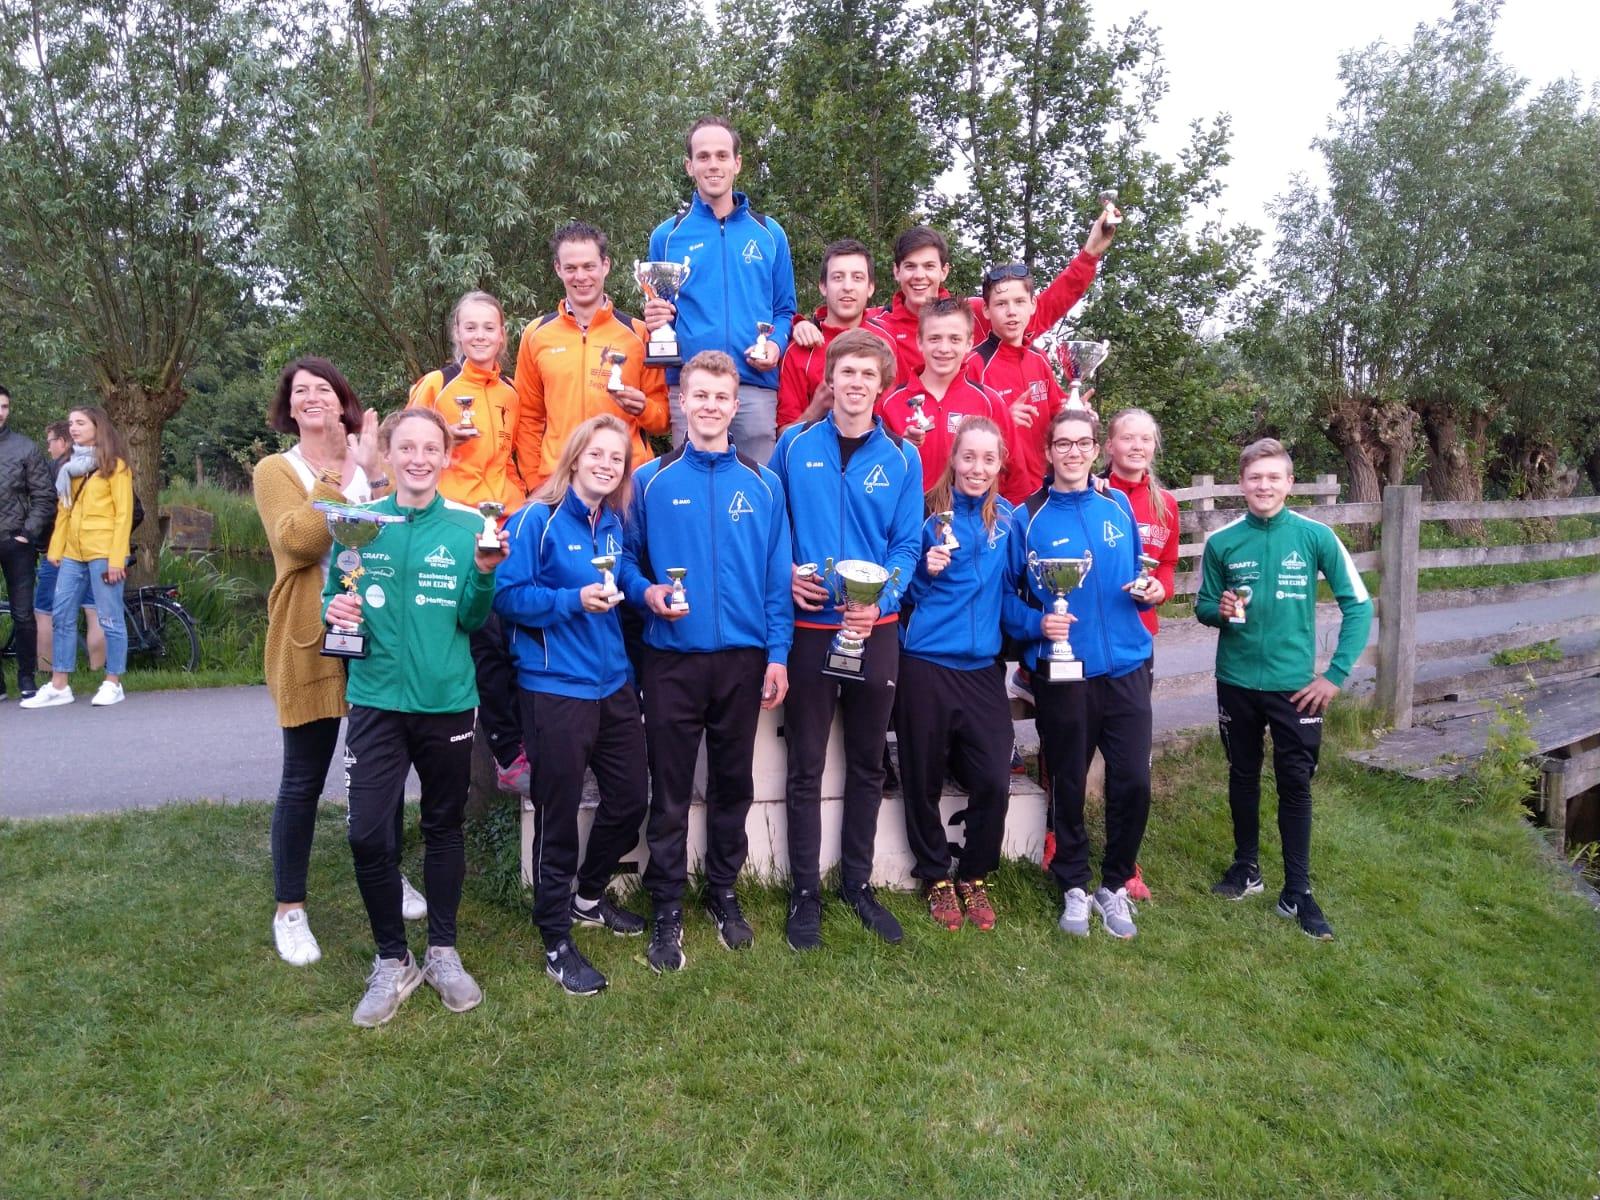 Rian Baas wint polsstokverspringen in Vlist